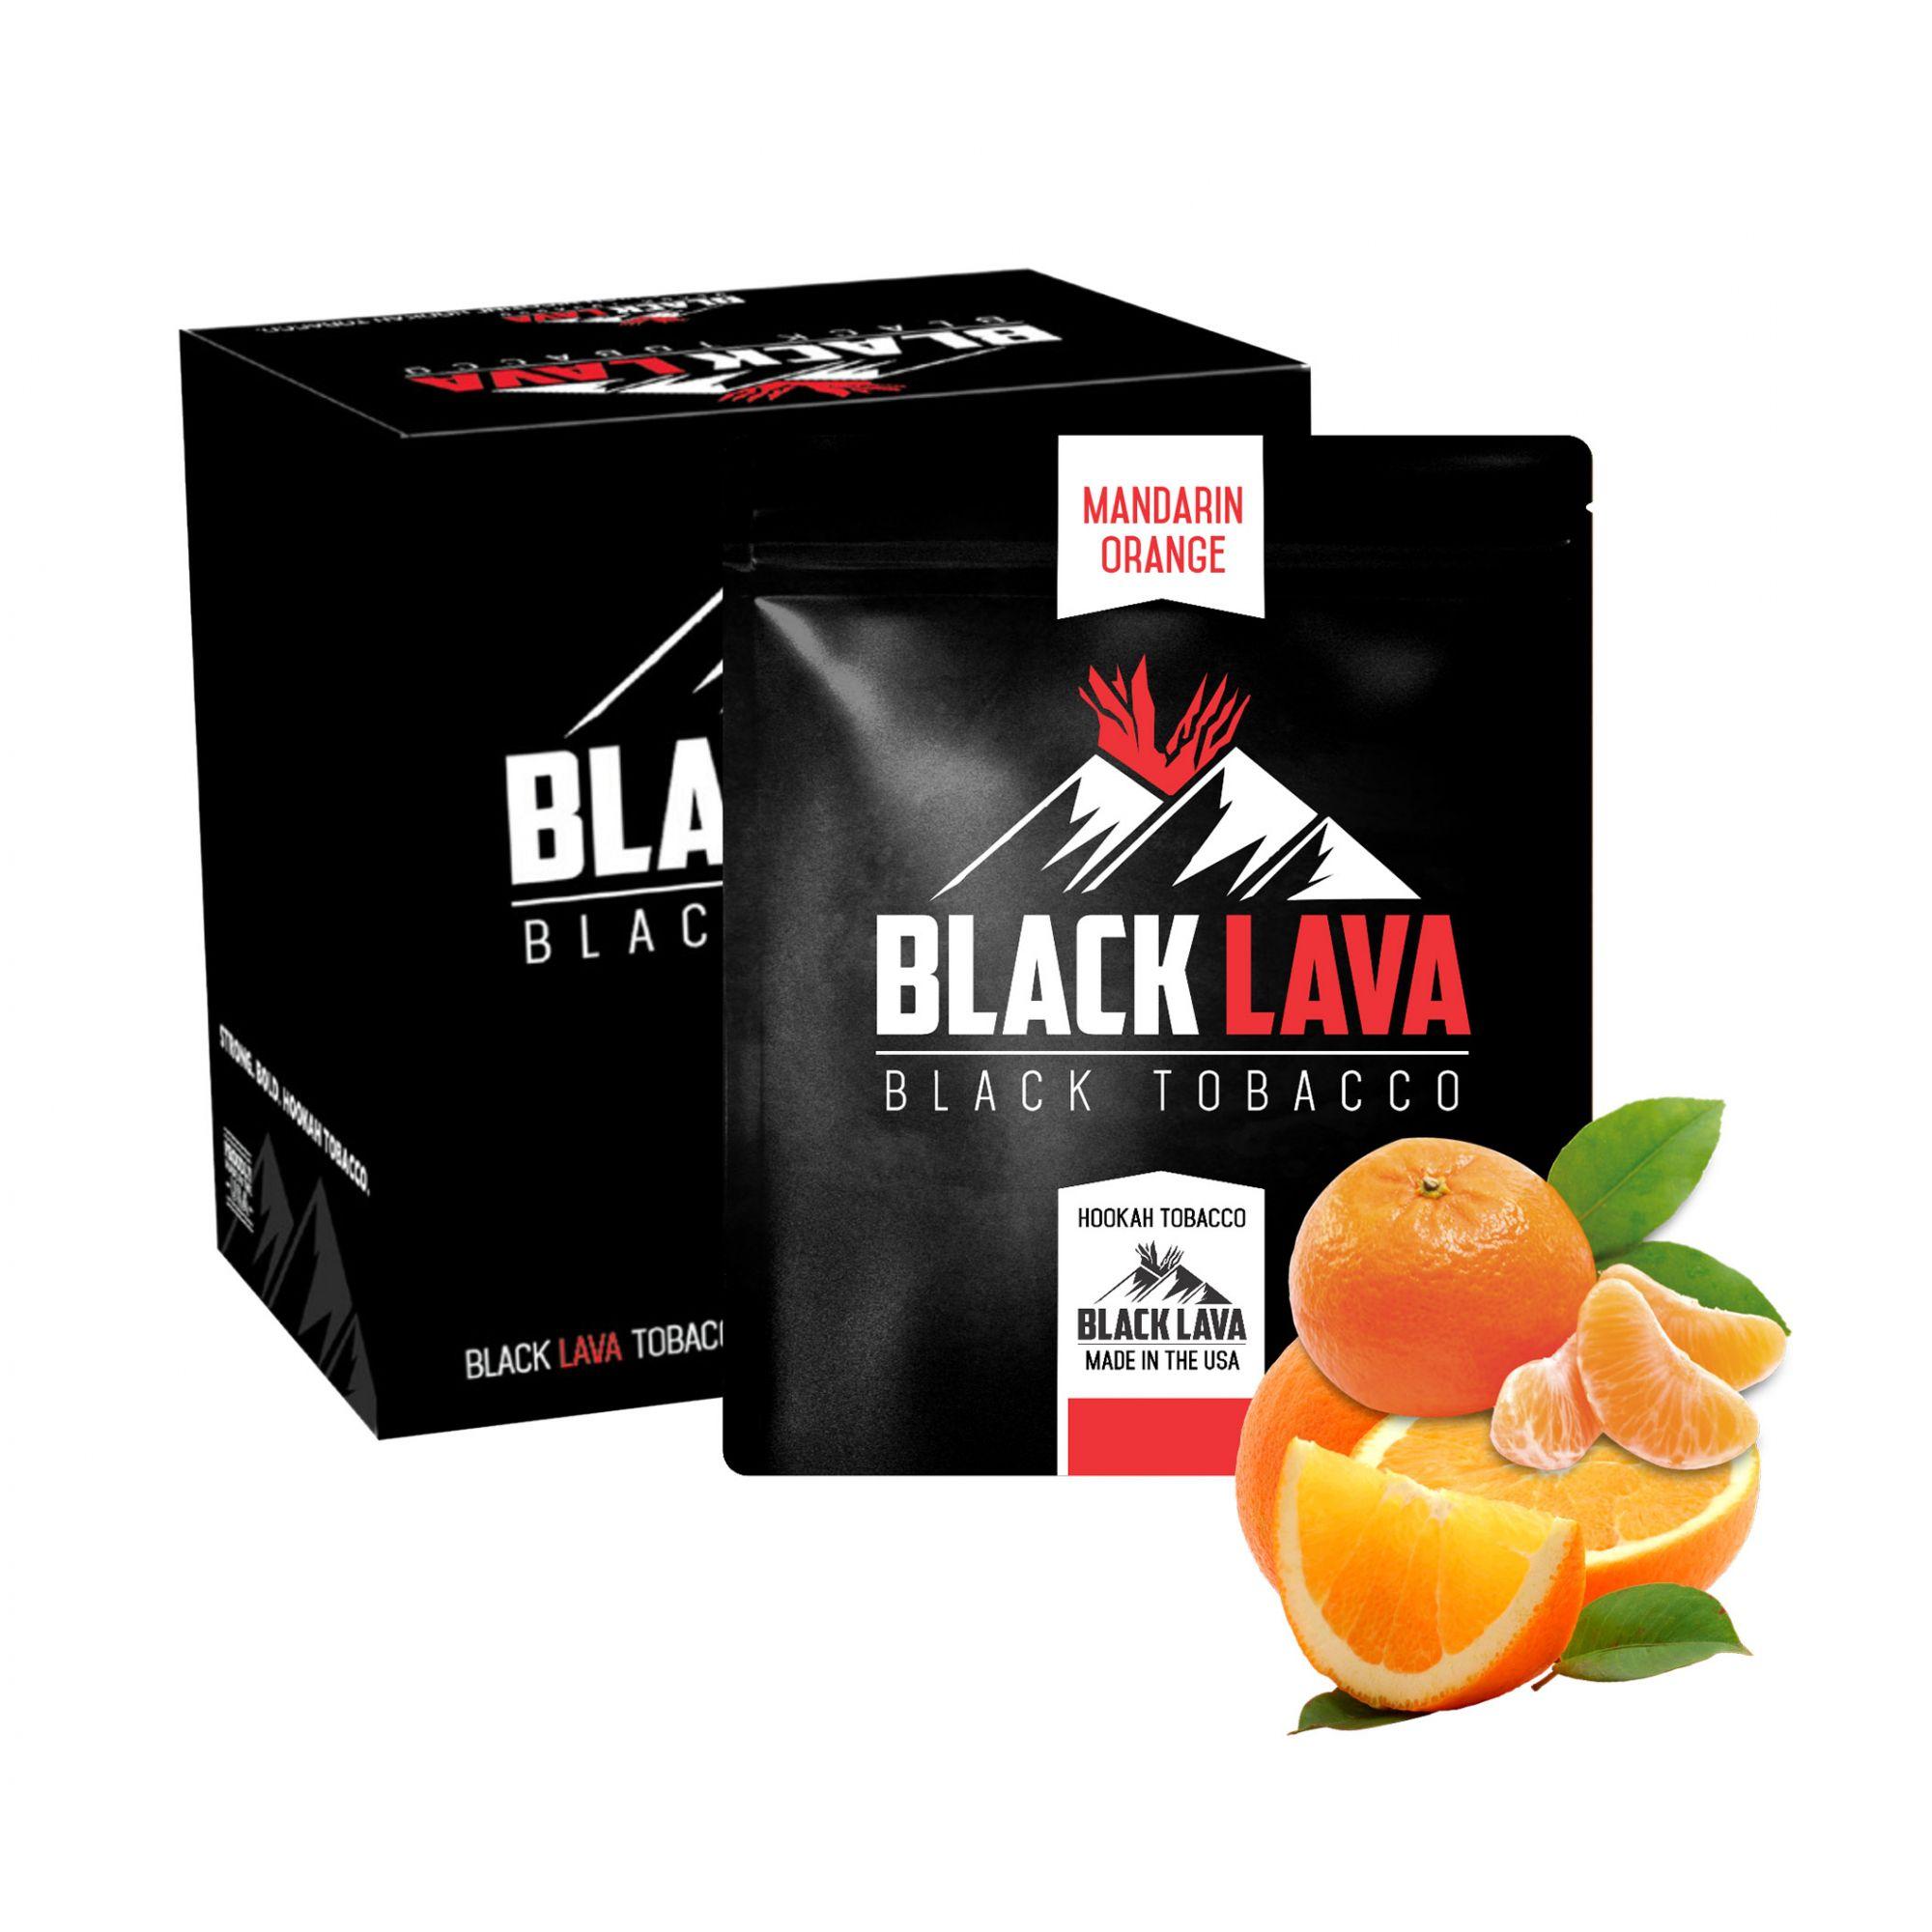 Black Lava - Mandarin Orange 200g